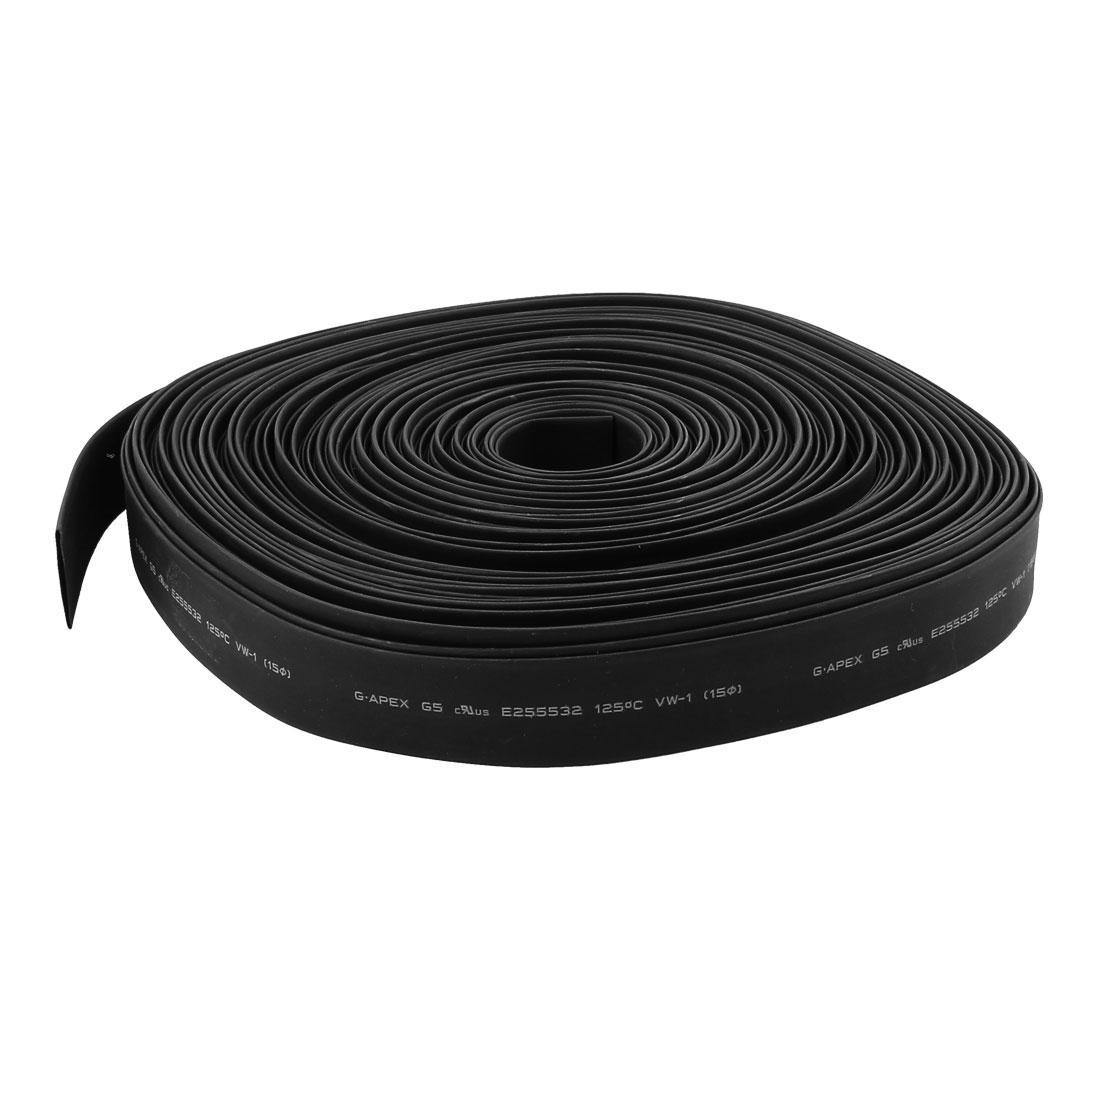 30m 15mm Dia Insulated PE Heat Shrink Tube 2:1 Shrinkage Ratio Waterproof Black